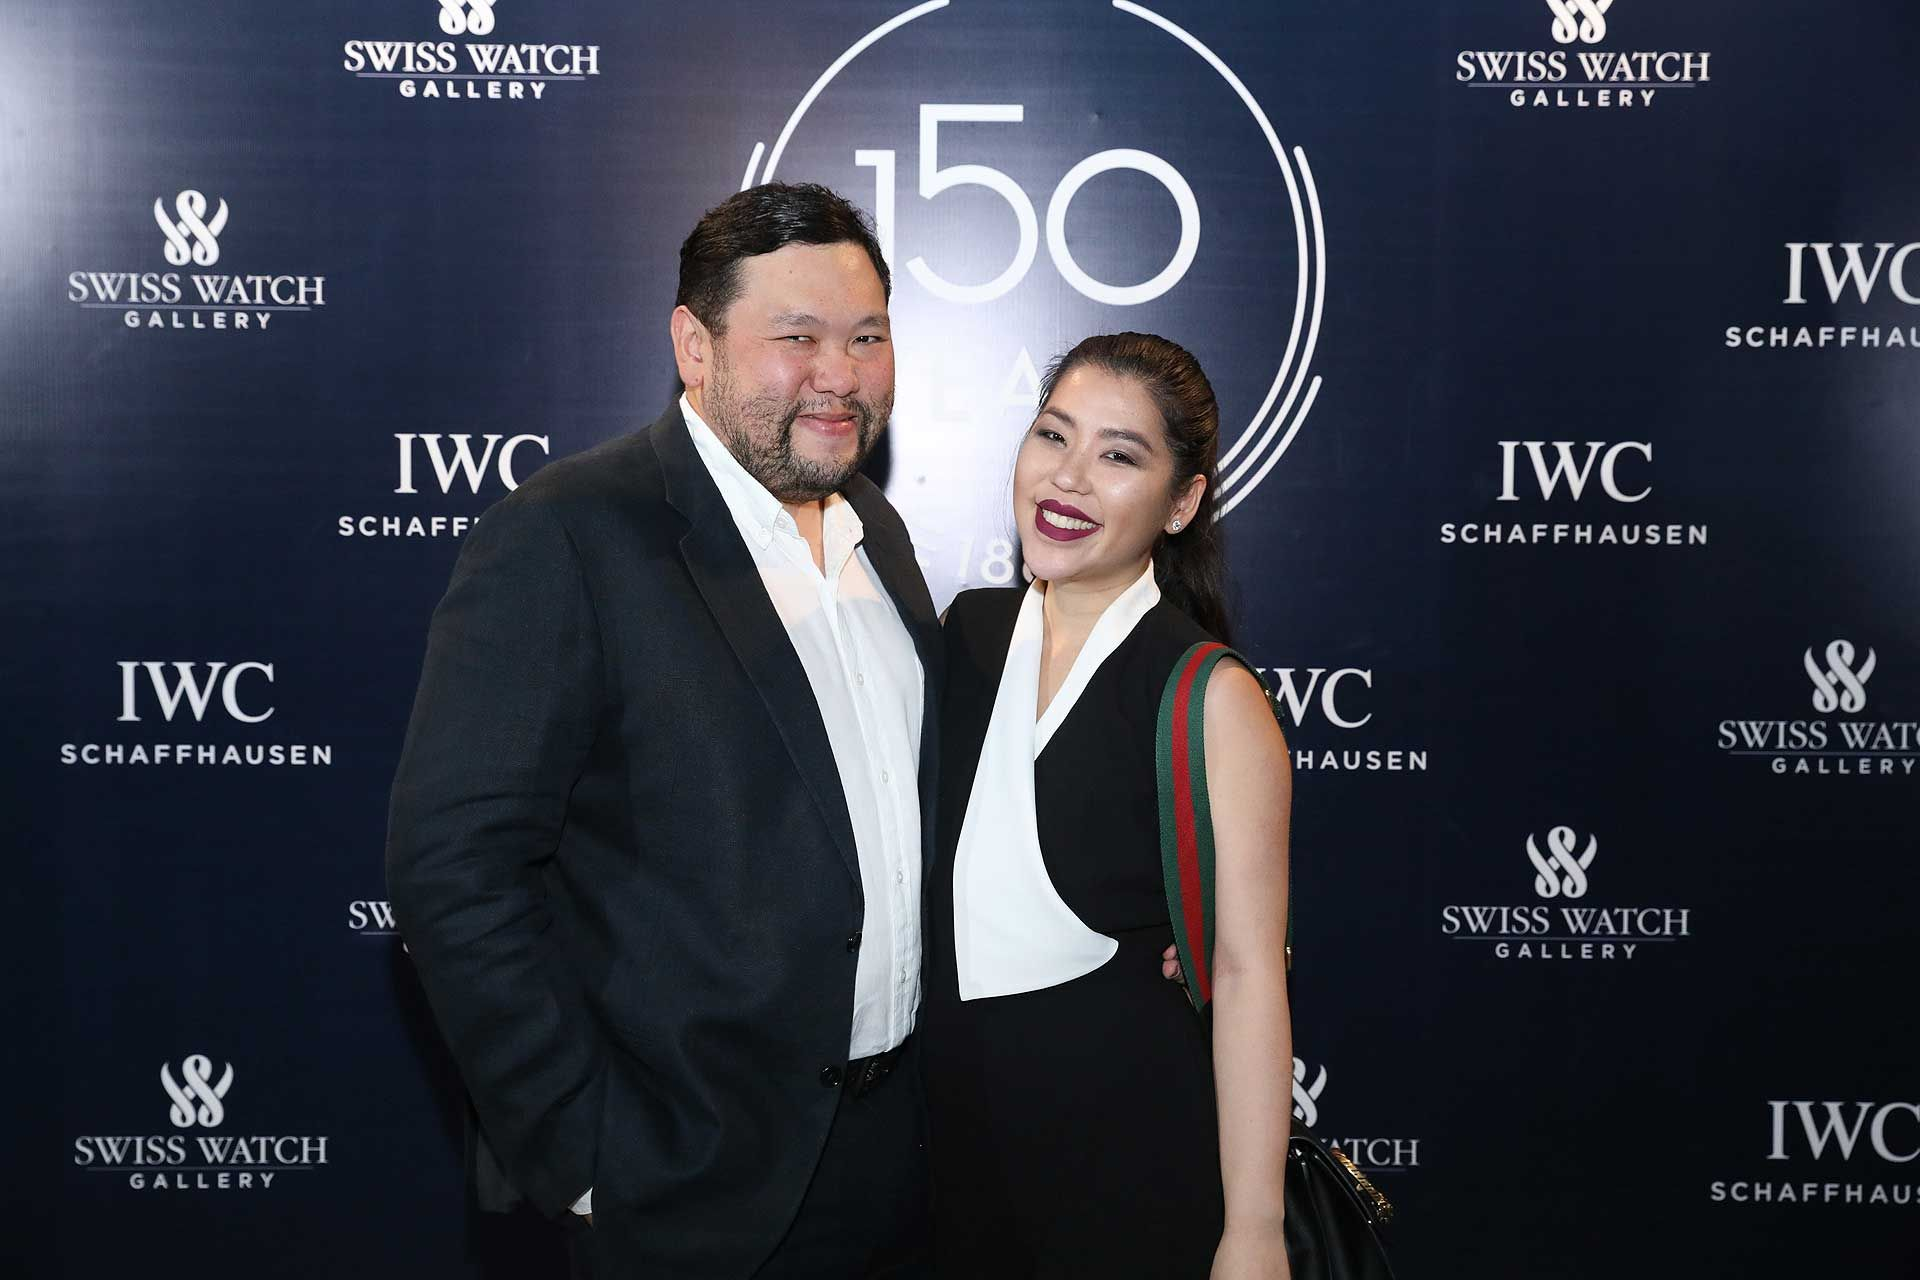 Benjamin Yong and Elizabeth Lee-Yong